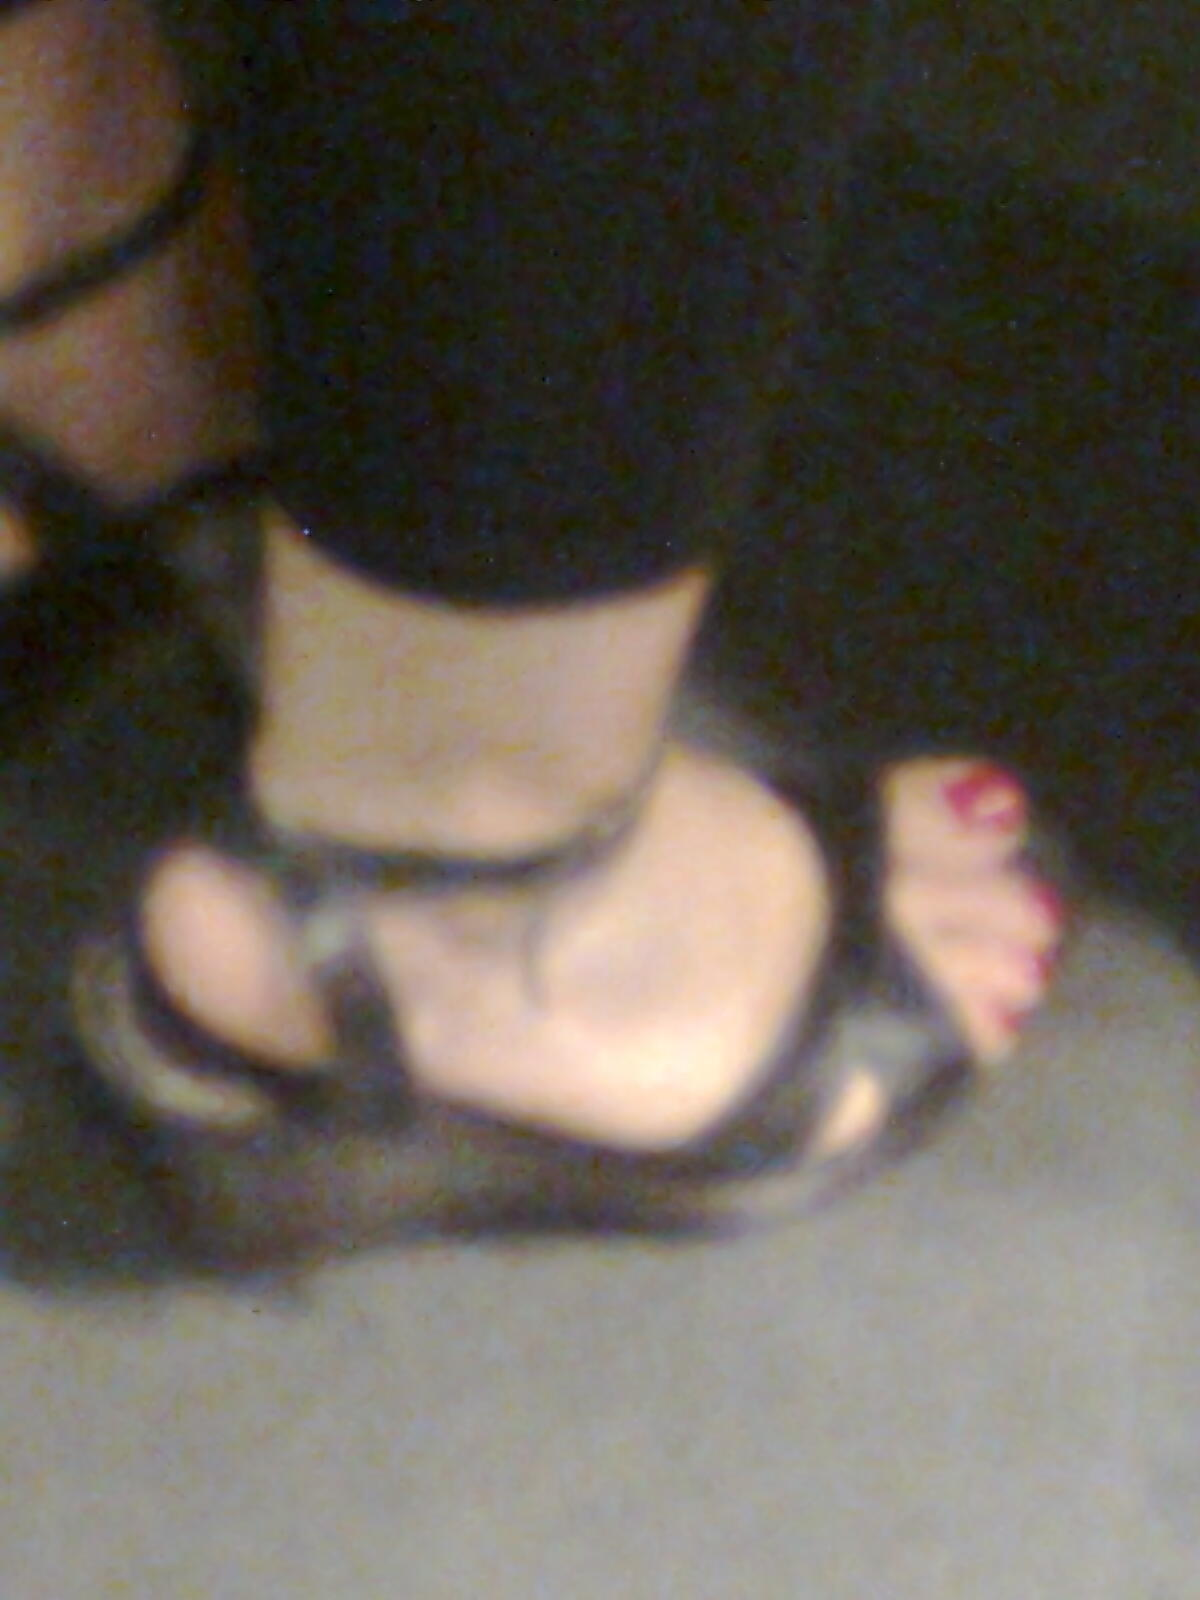 foot fetish eva aichmajerová